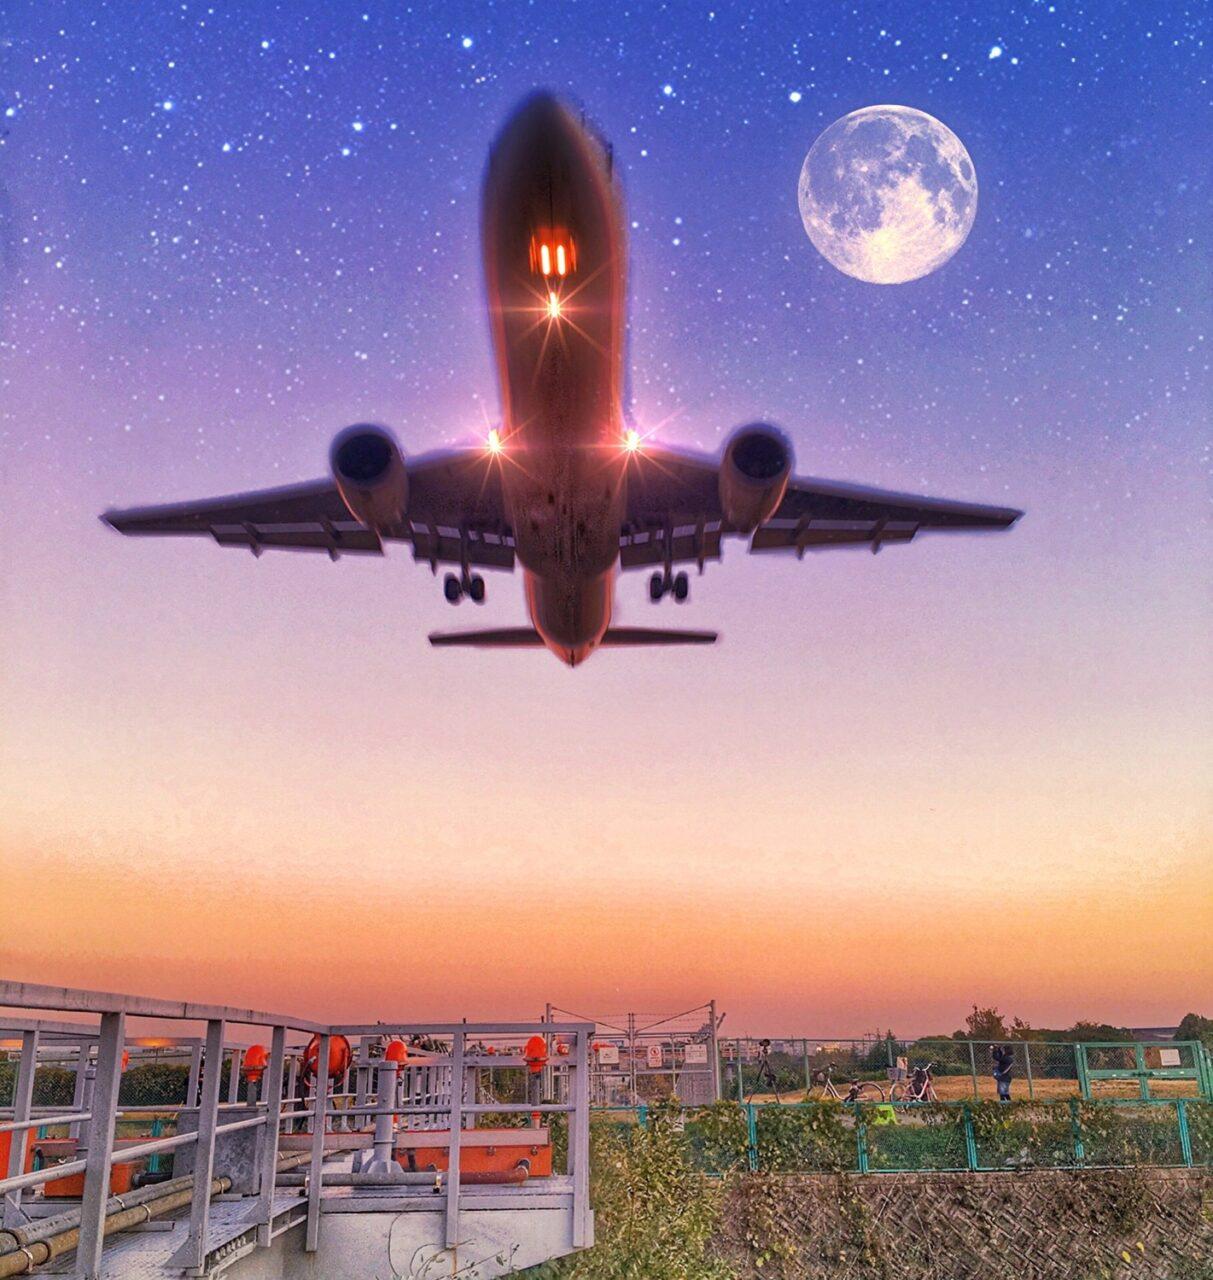 TVで海外旅行をエンジョイしよ。おうちで世界に飛んだ気分を満喫できるミニ番組